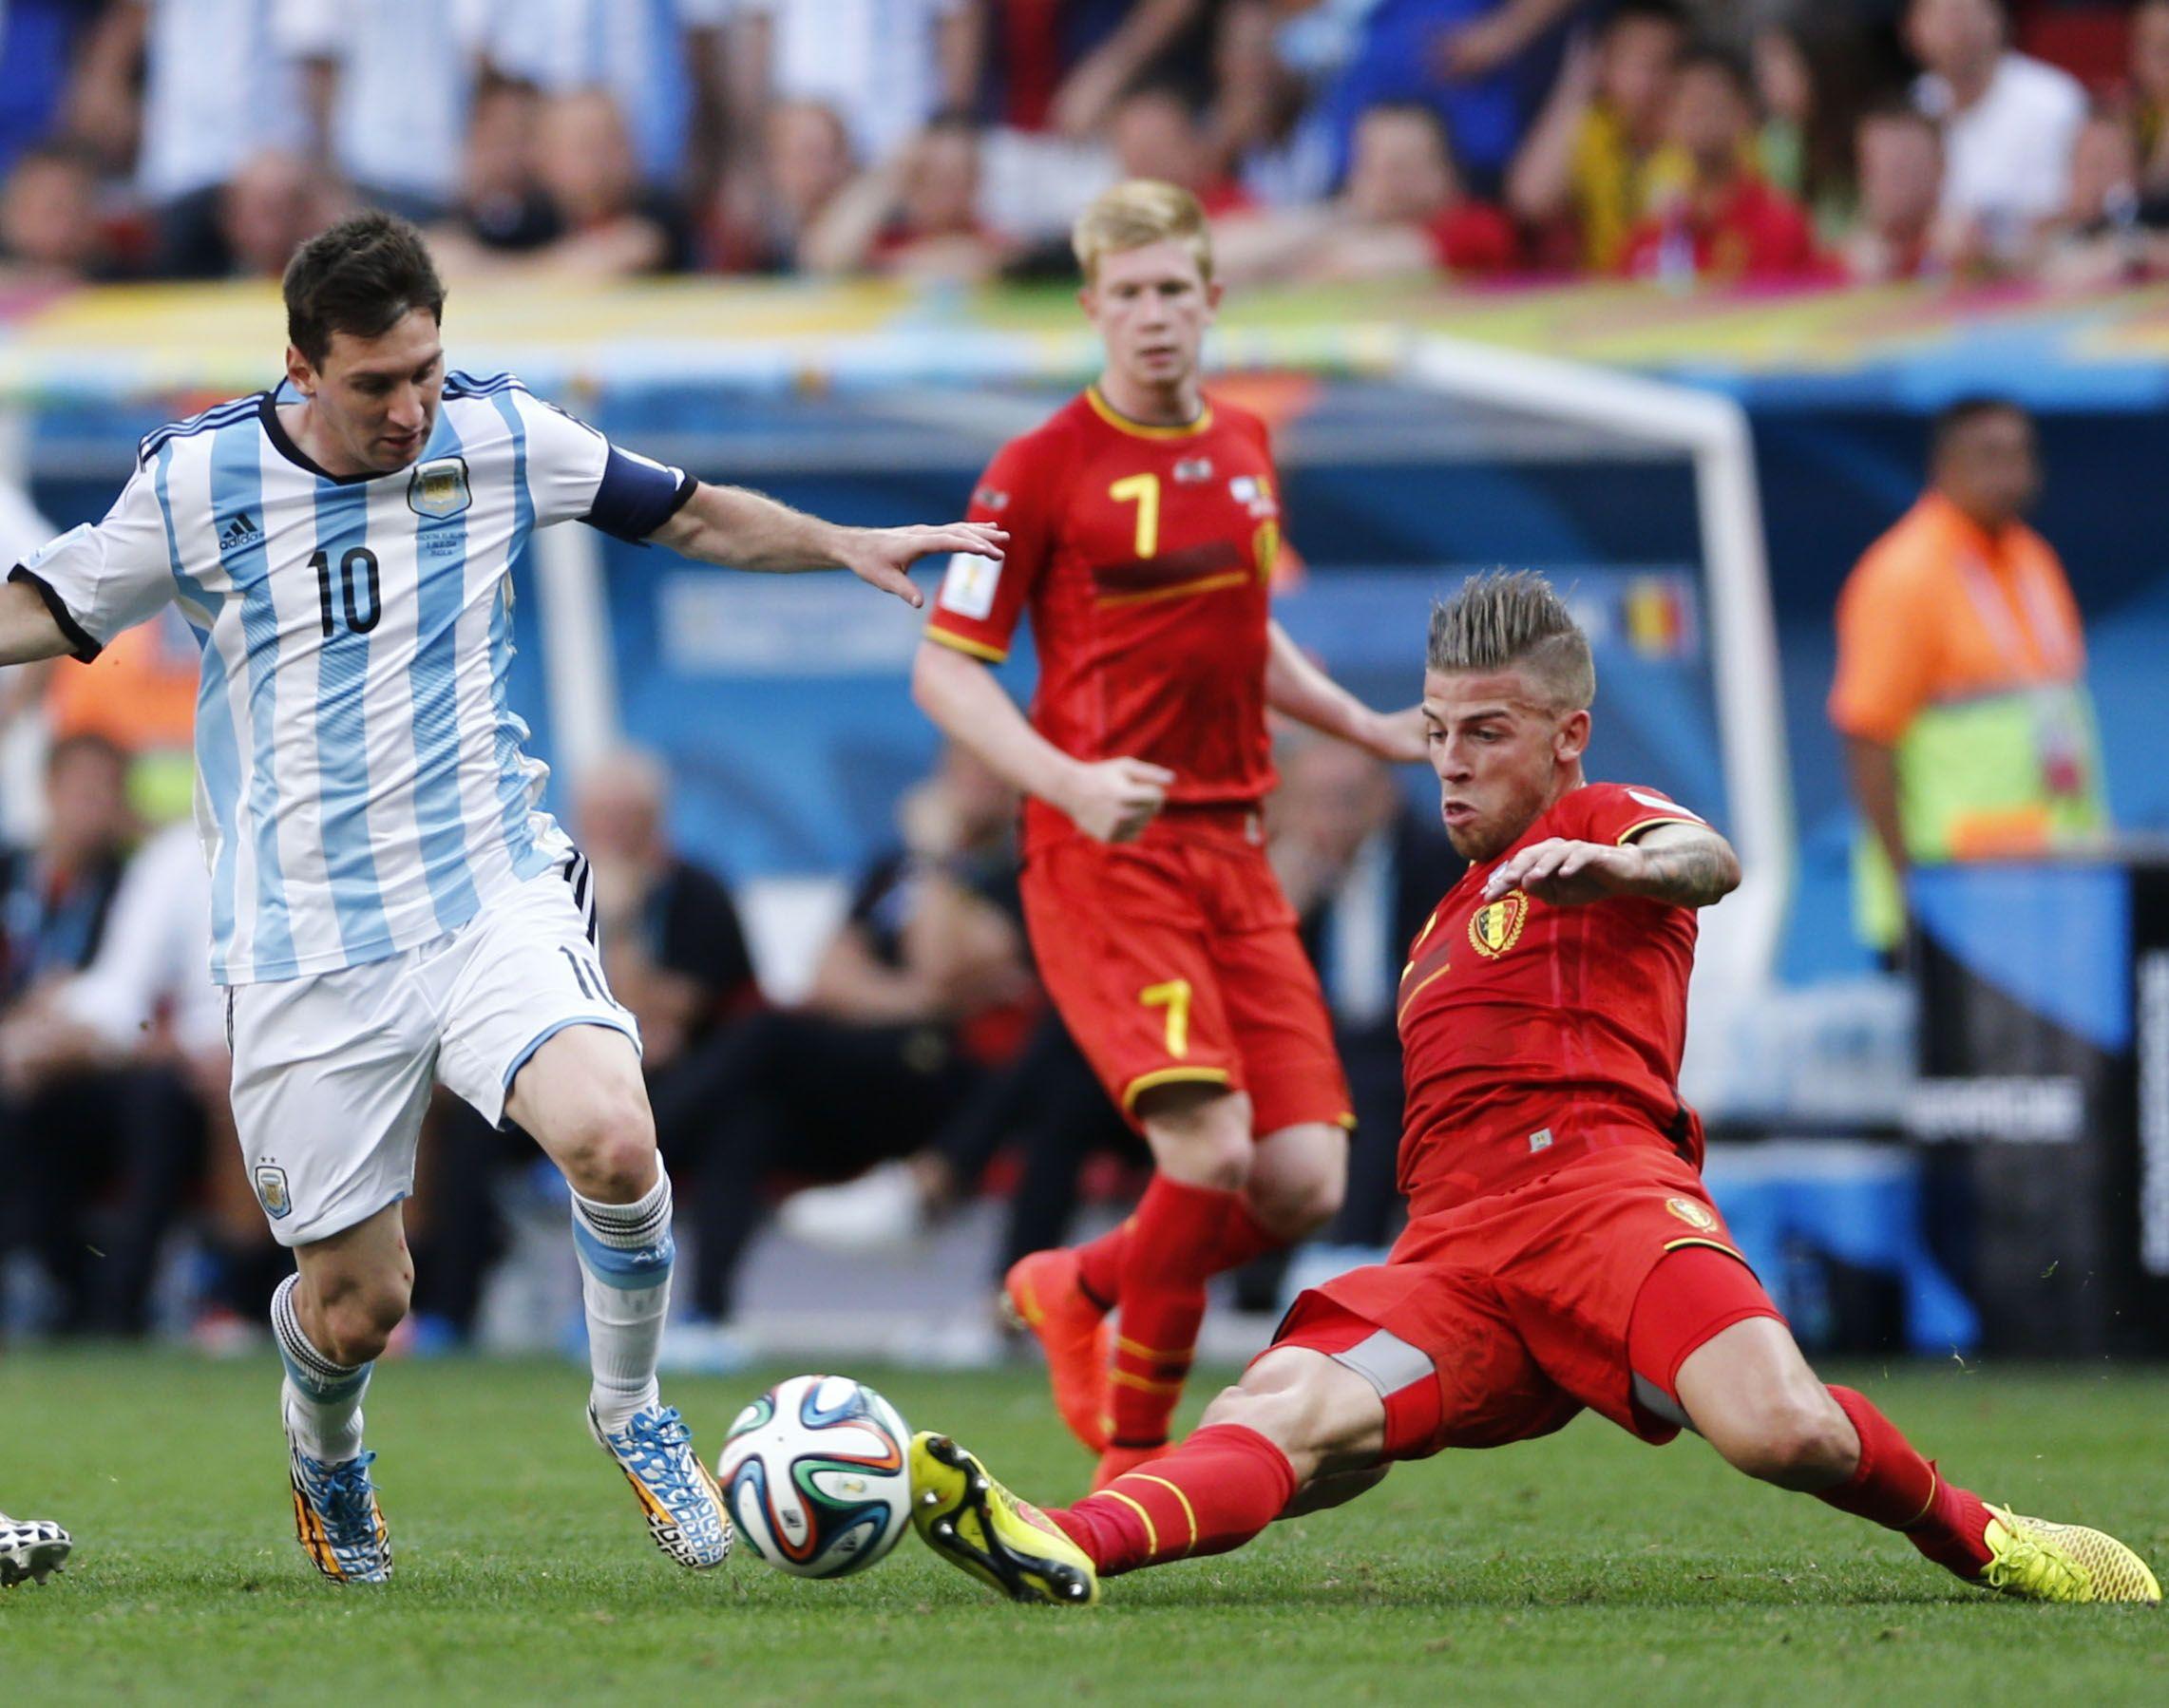 Argentina eliminó a Bélgica en los cuartos de final de Brasil 2014